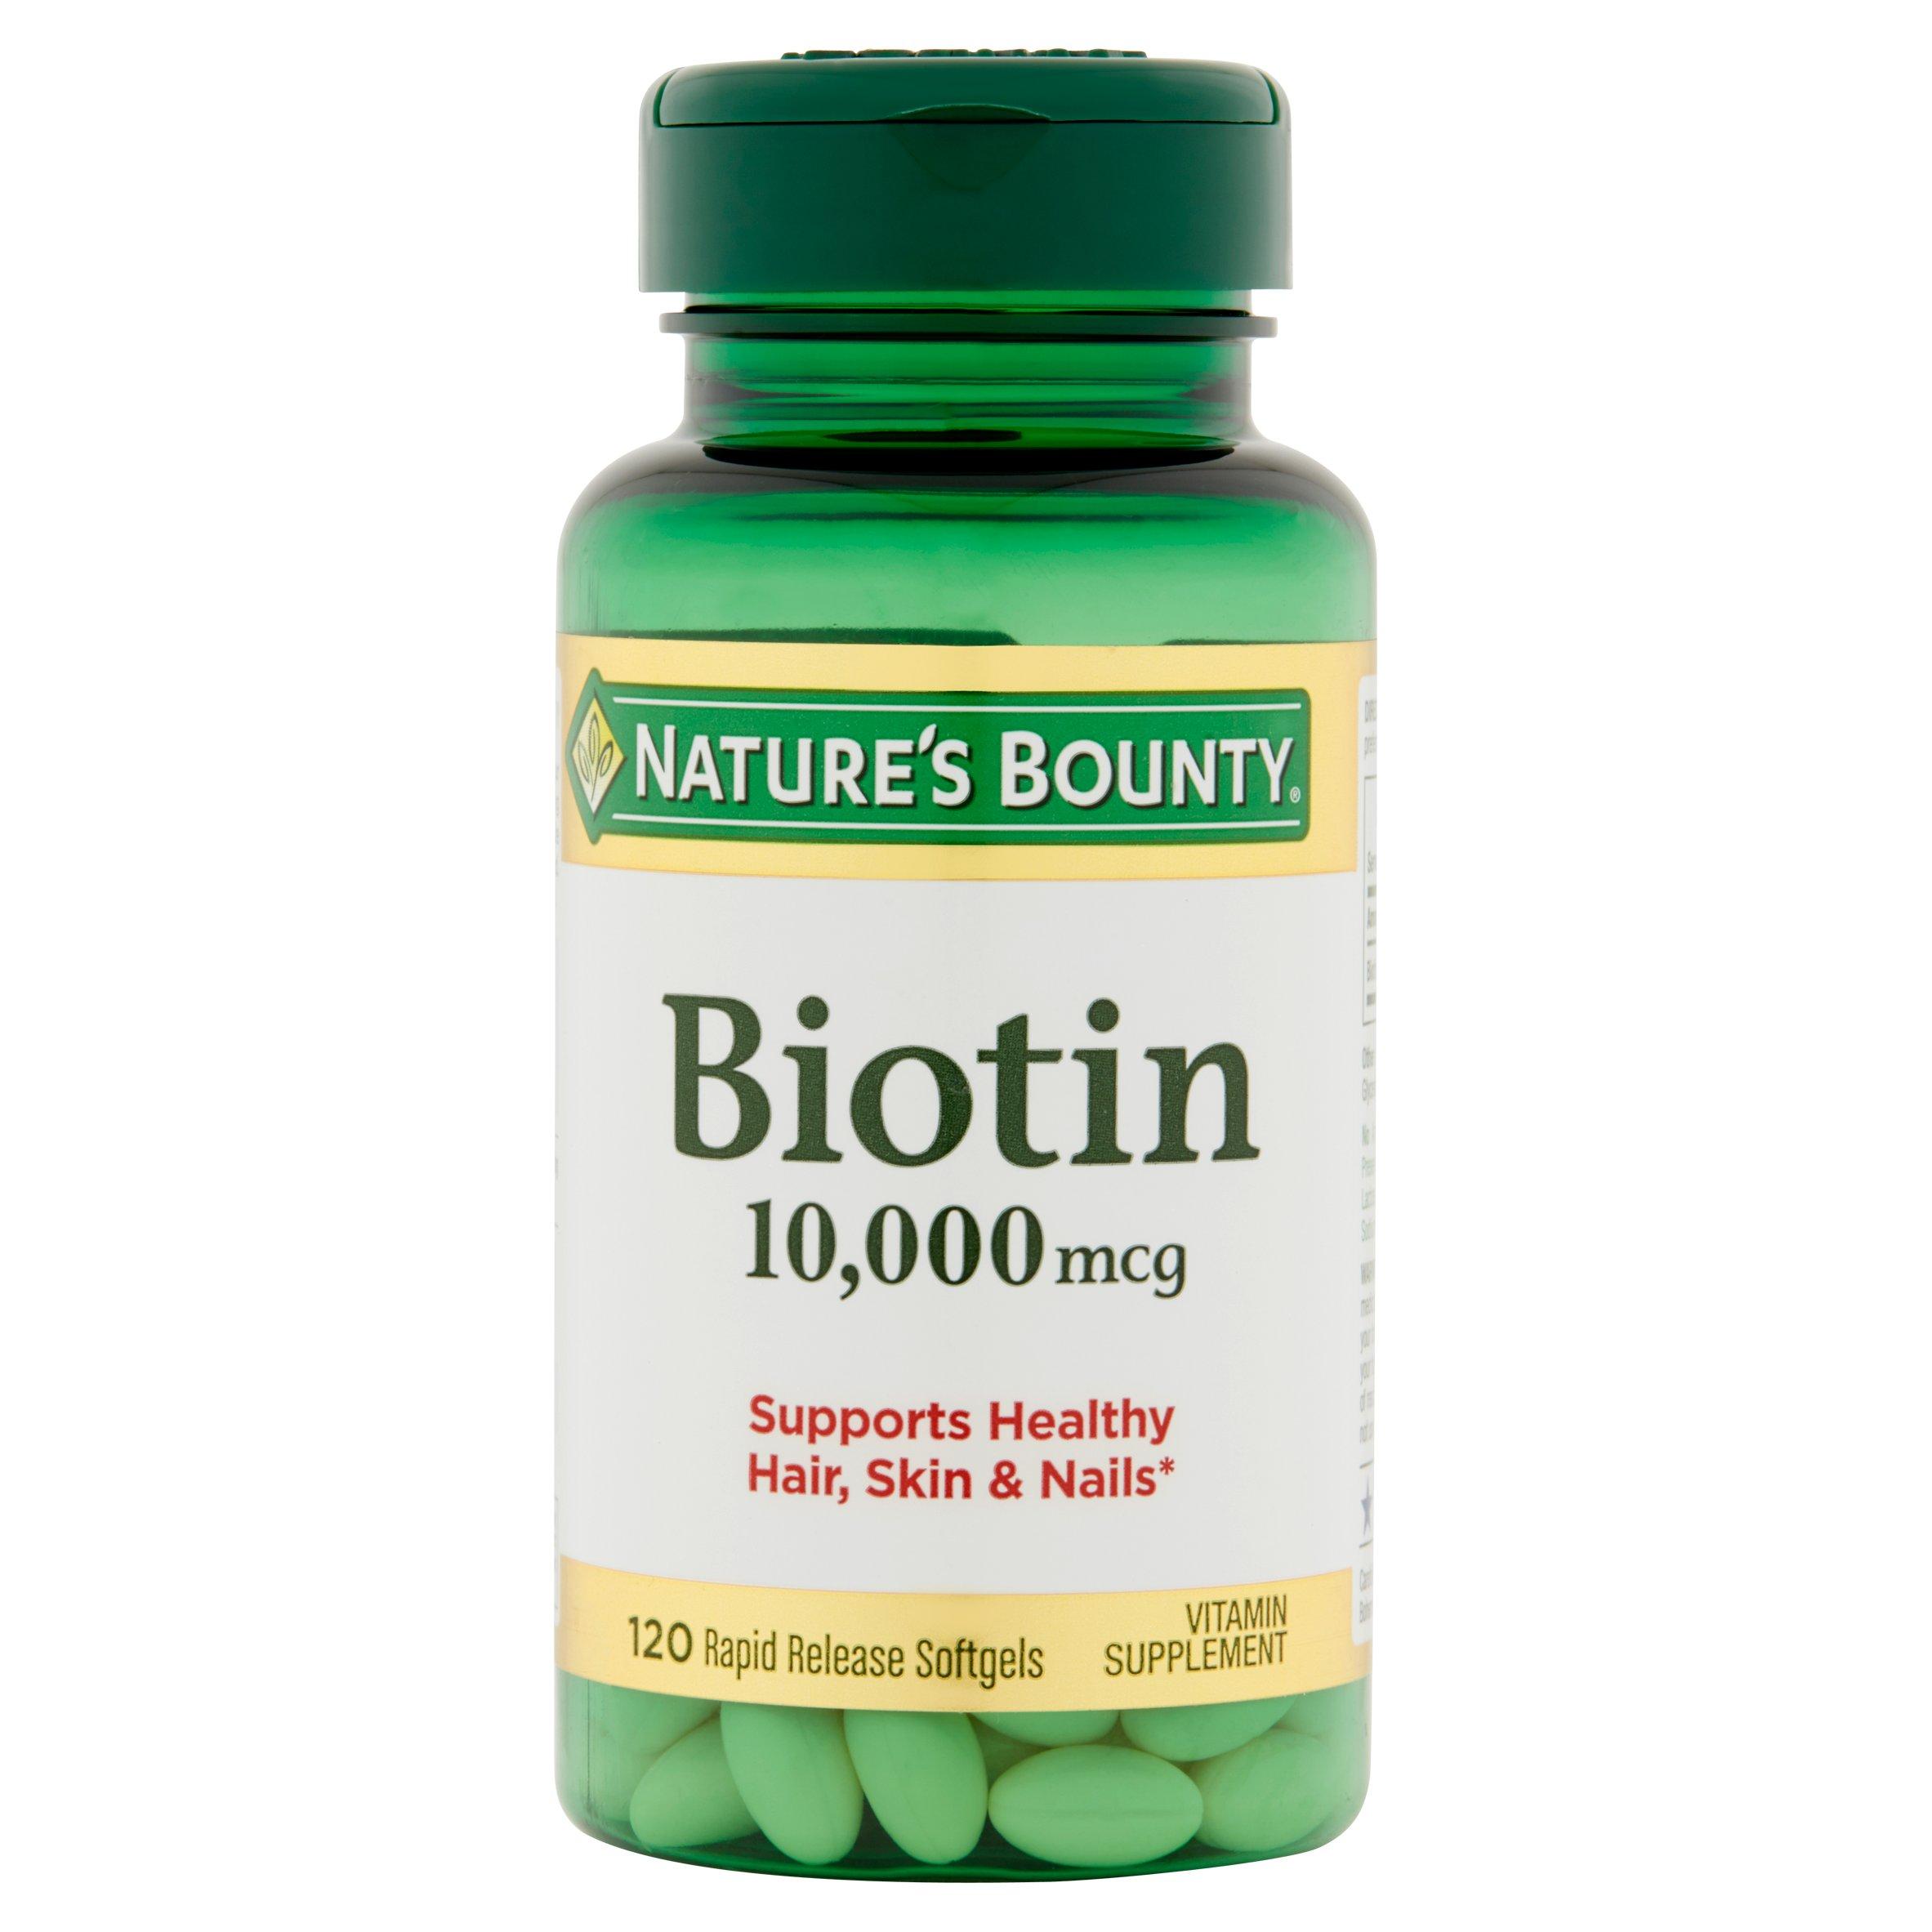 Nature's Bounty Biotin 10,000 mcg, 120 Softgels